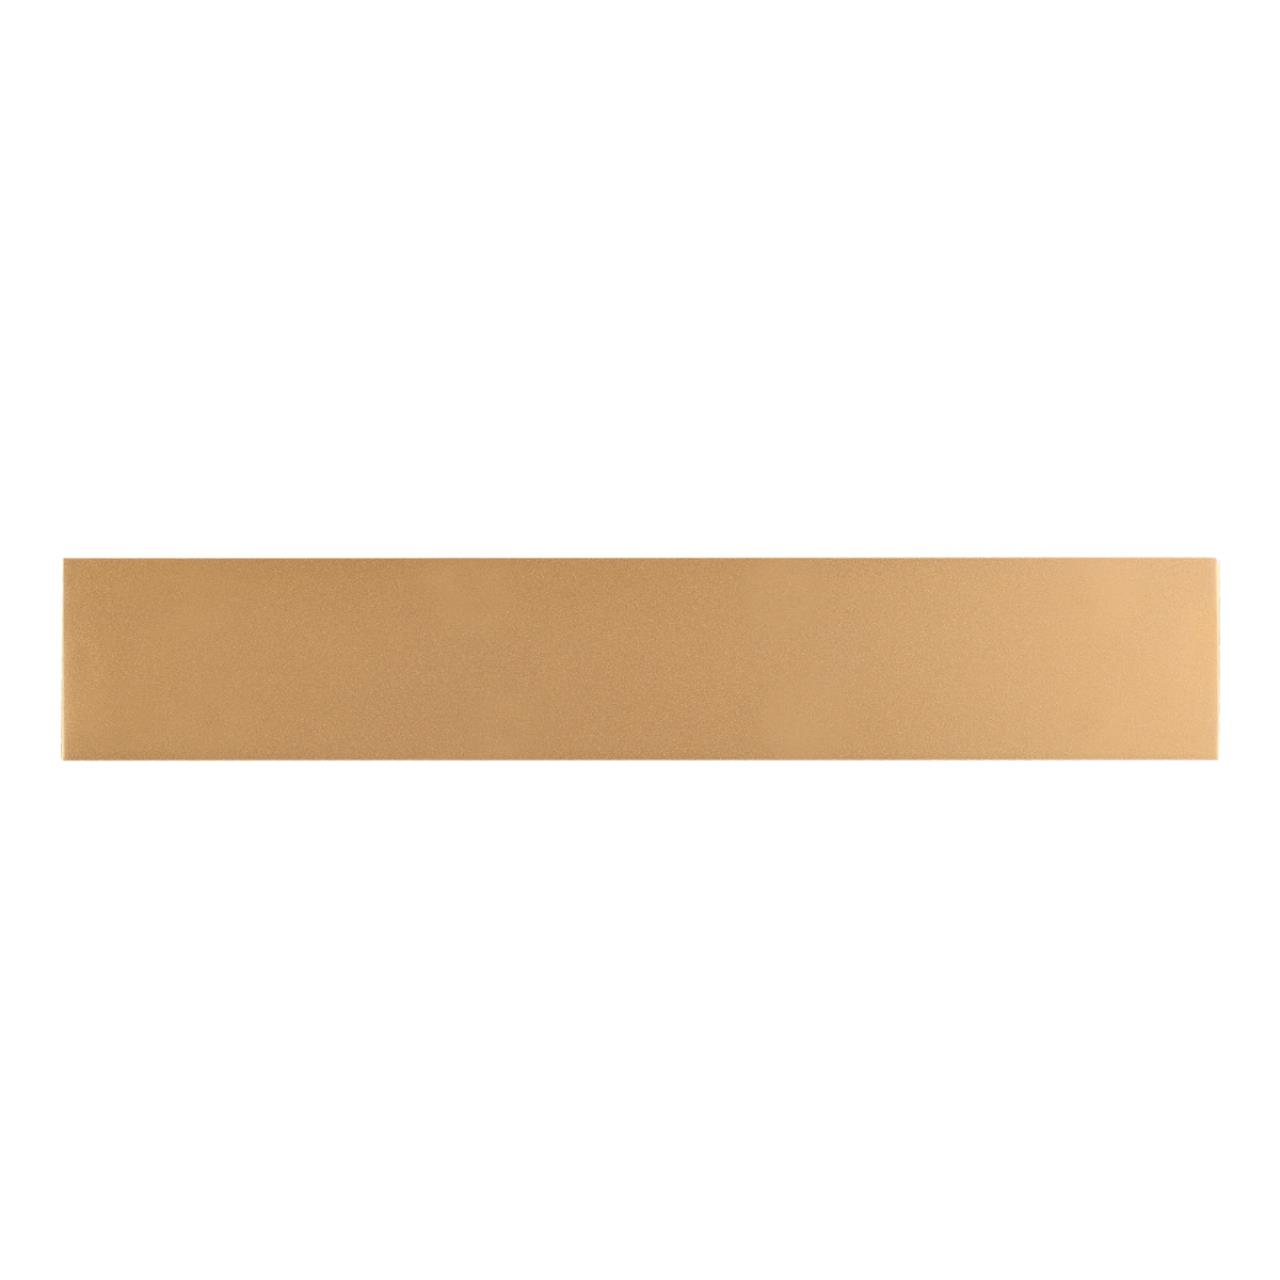 3893/16WL HIGHTECH ODL20 181 золотистый/металл Настенный светильник LED 3000K 16W 220V MAGNUM